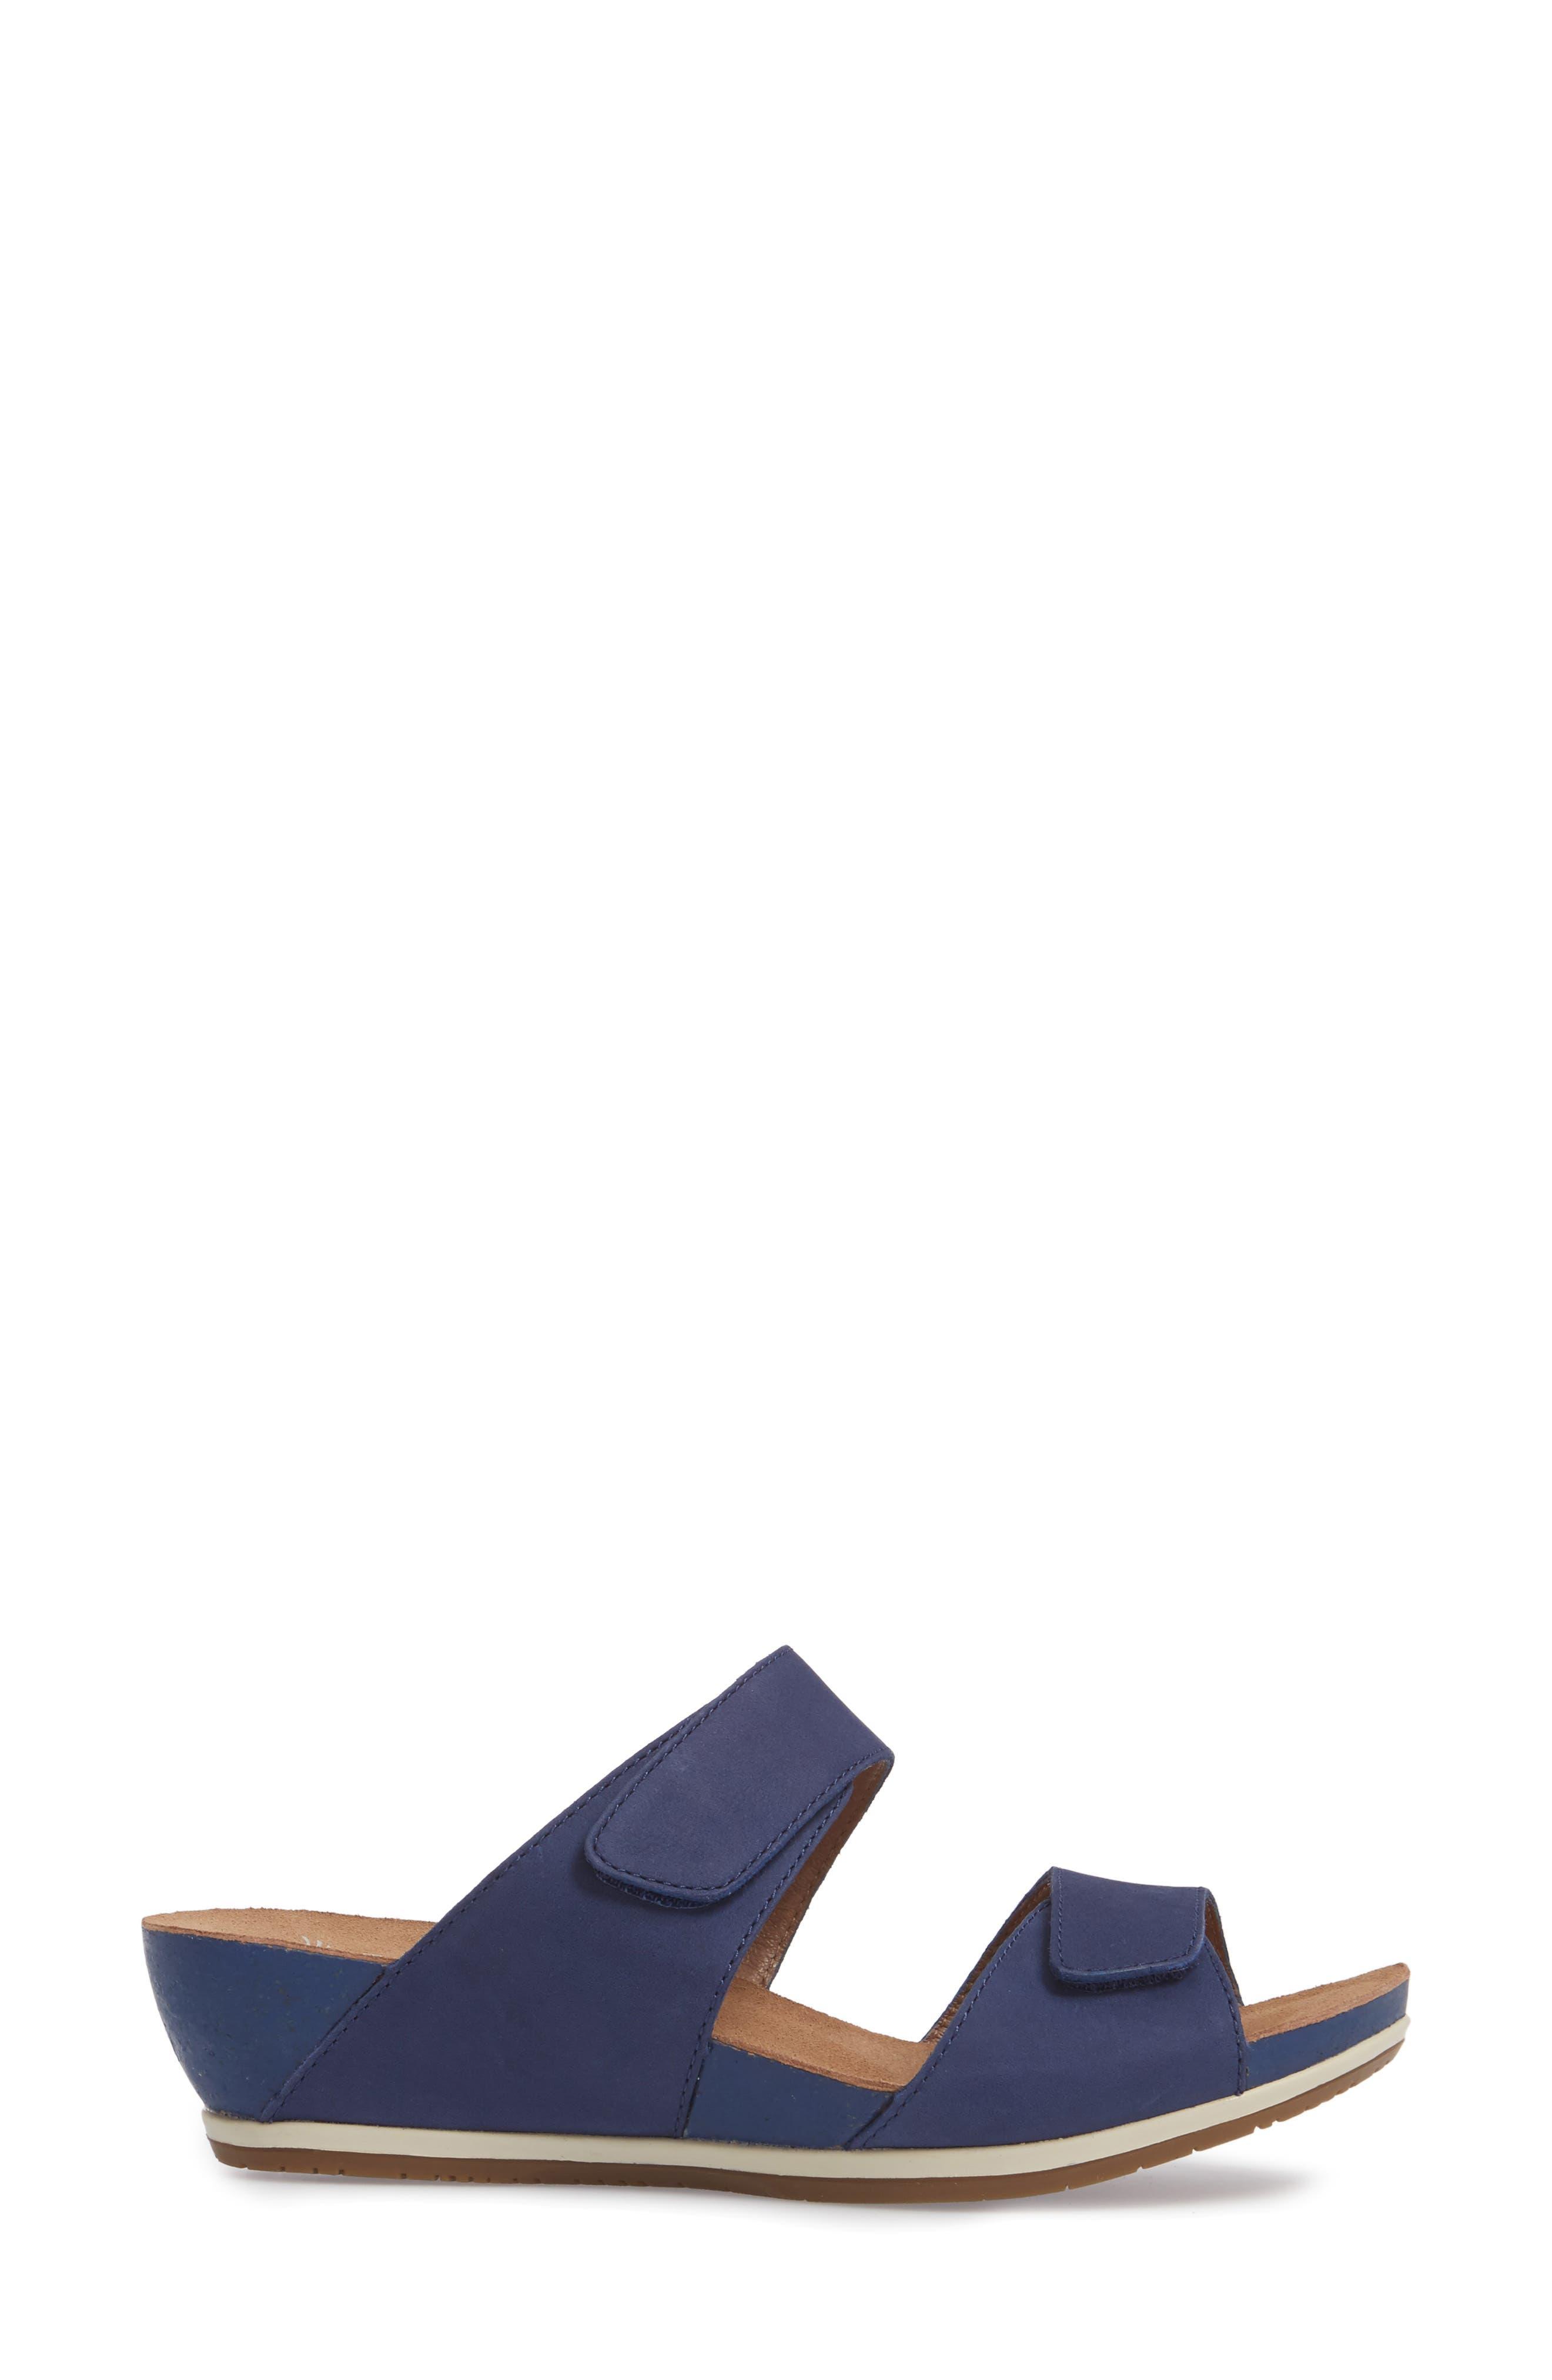 Vienna Slide Sandal,                             Alternate thumbnail 3, color,                             Blue Milled Nubuck Leather